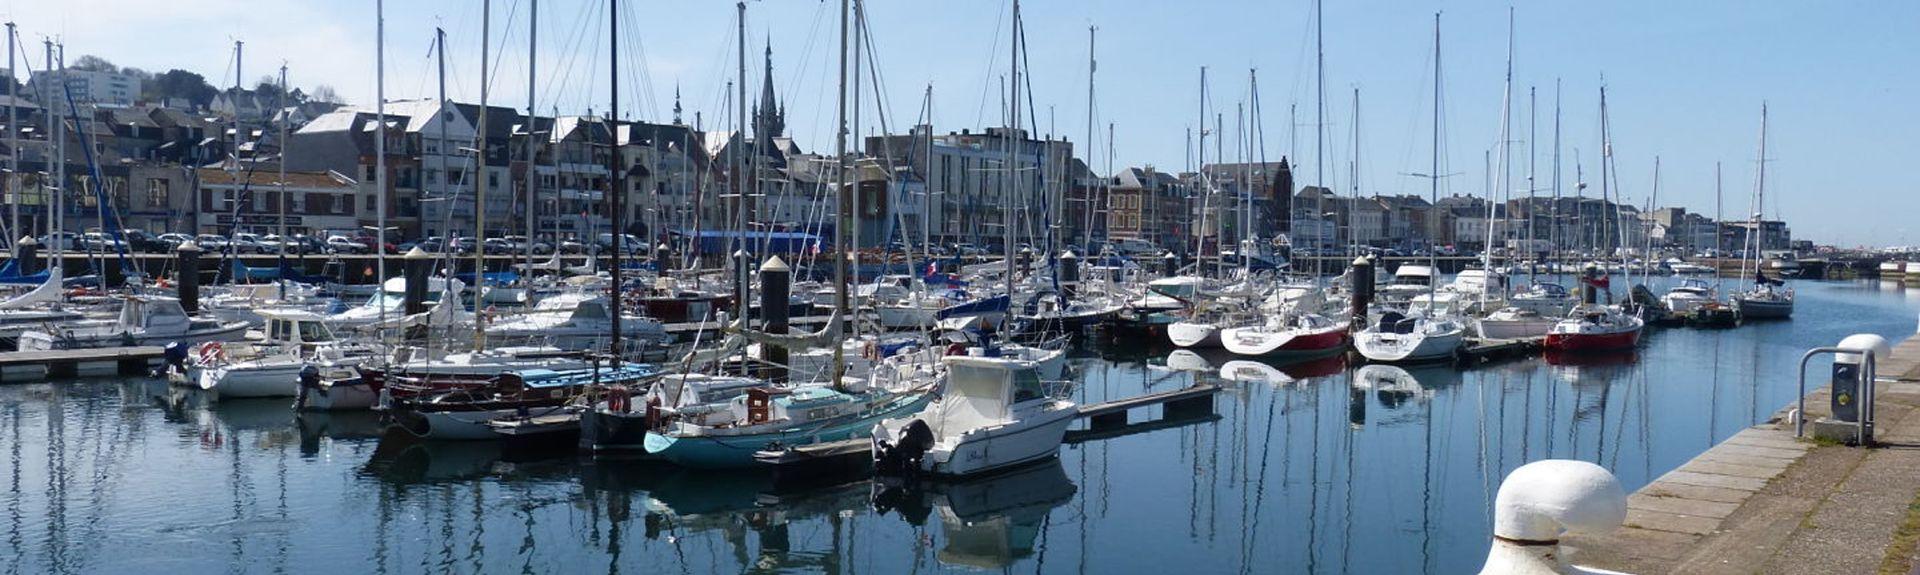 Terres-de-Caux, Seine-Maritime (departementti), Ranska